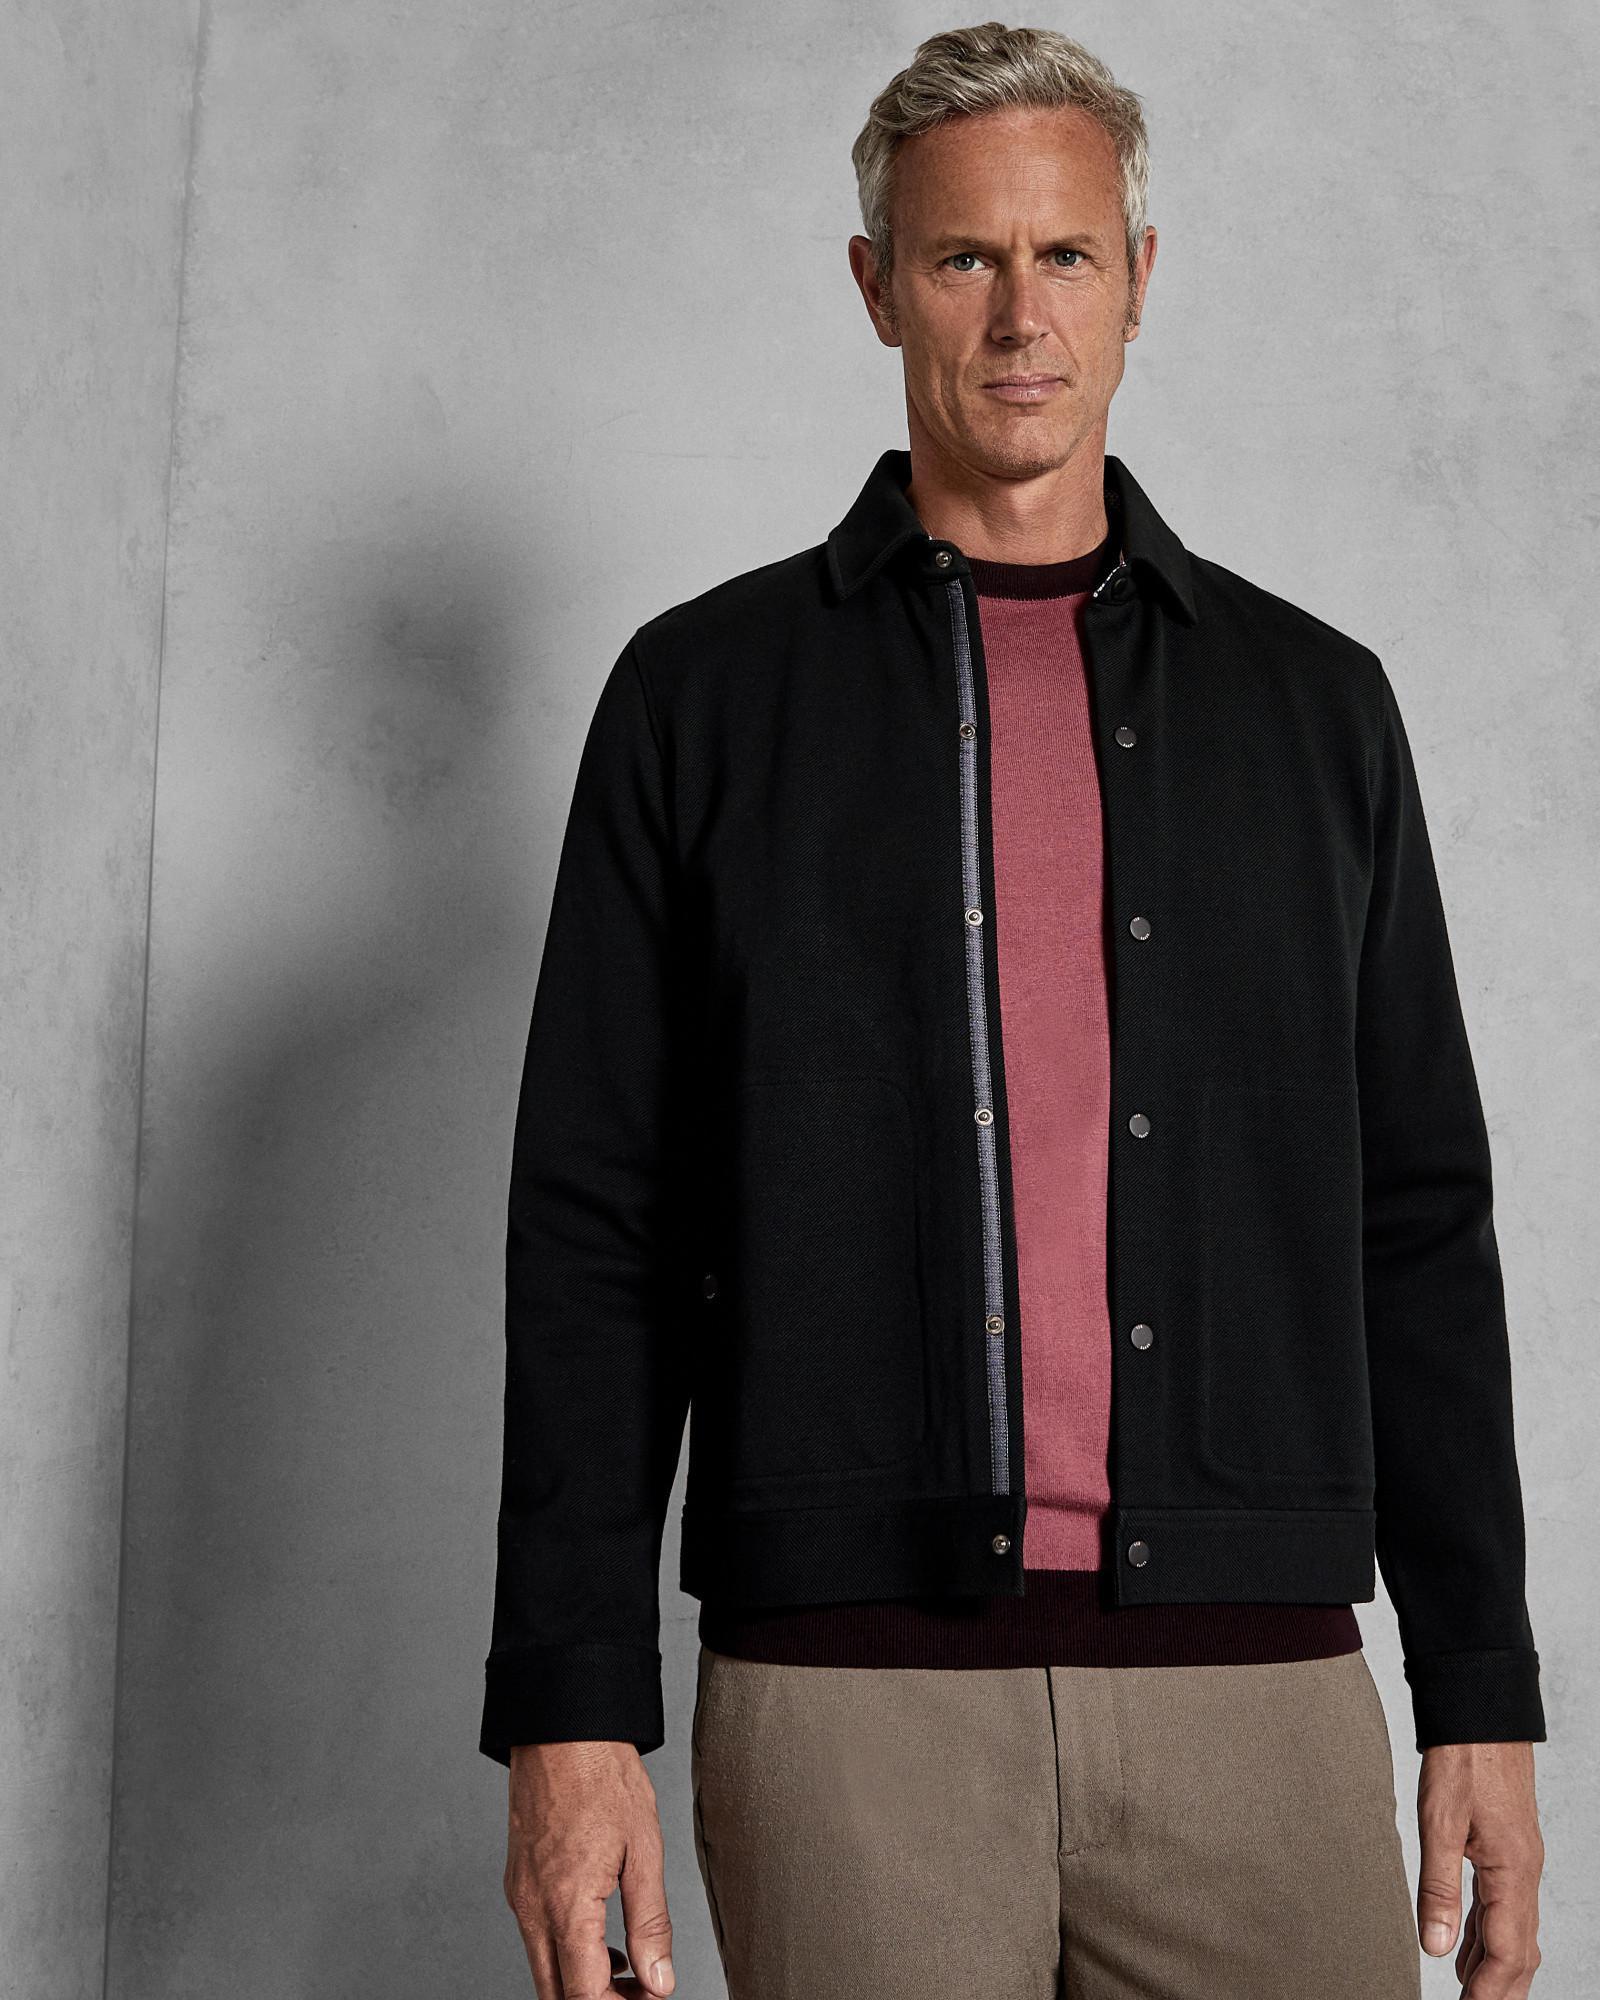 7d4802d3624f3c Ted Baker Twill Jacket in Black for Men - Lyst